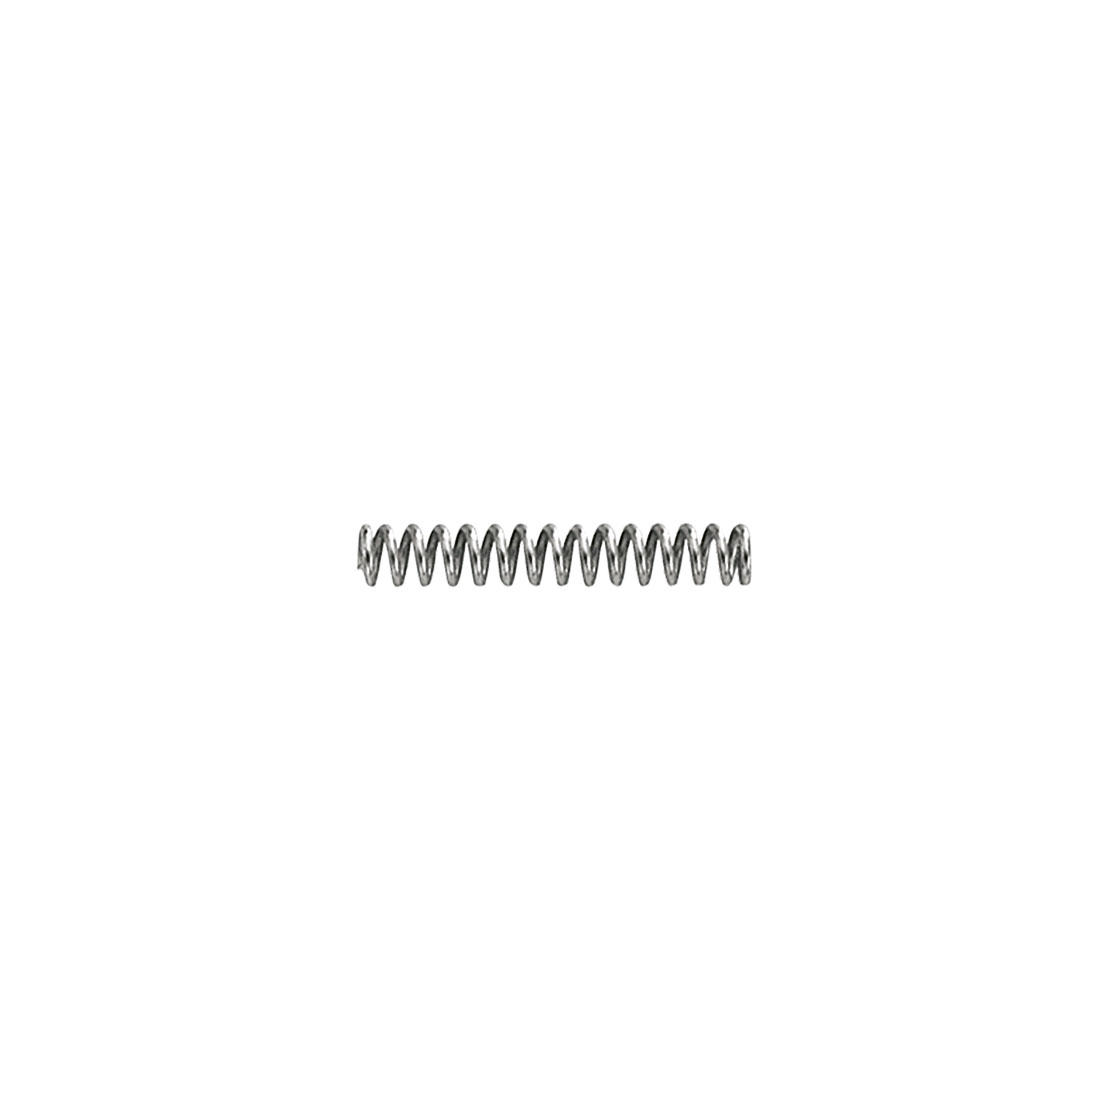 1001710-Spring-for-pruners-111430-111440-111450-111510-111520.jpg